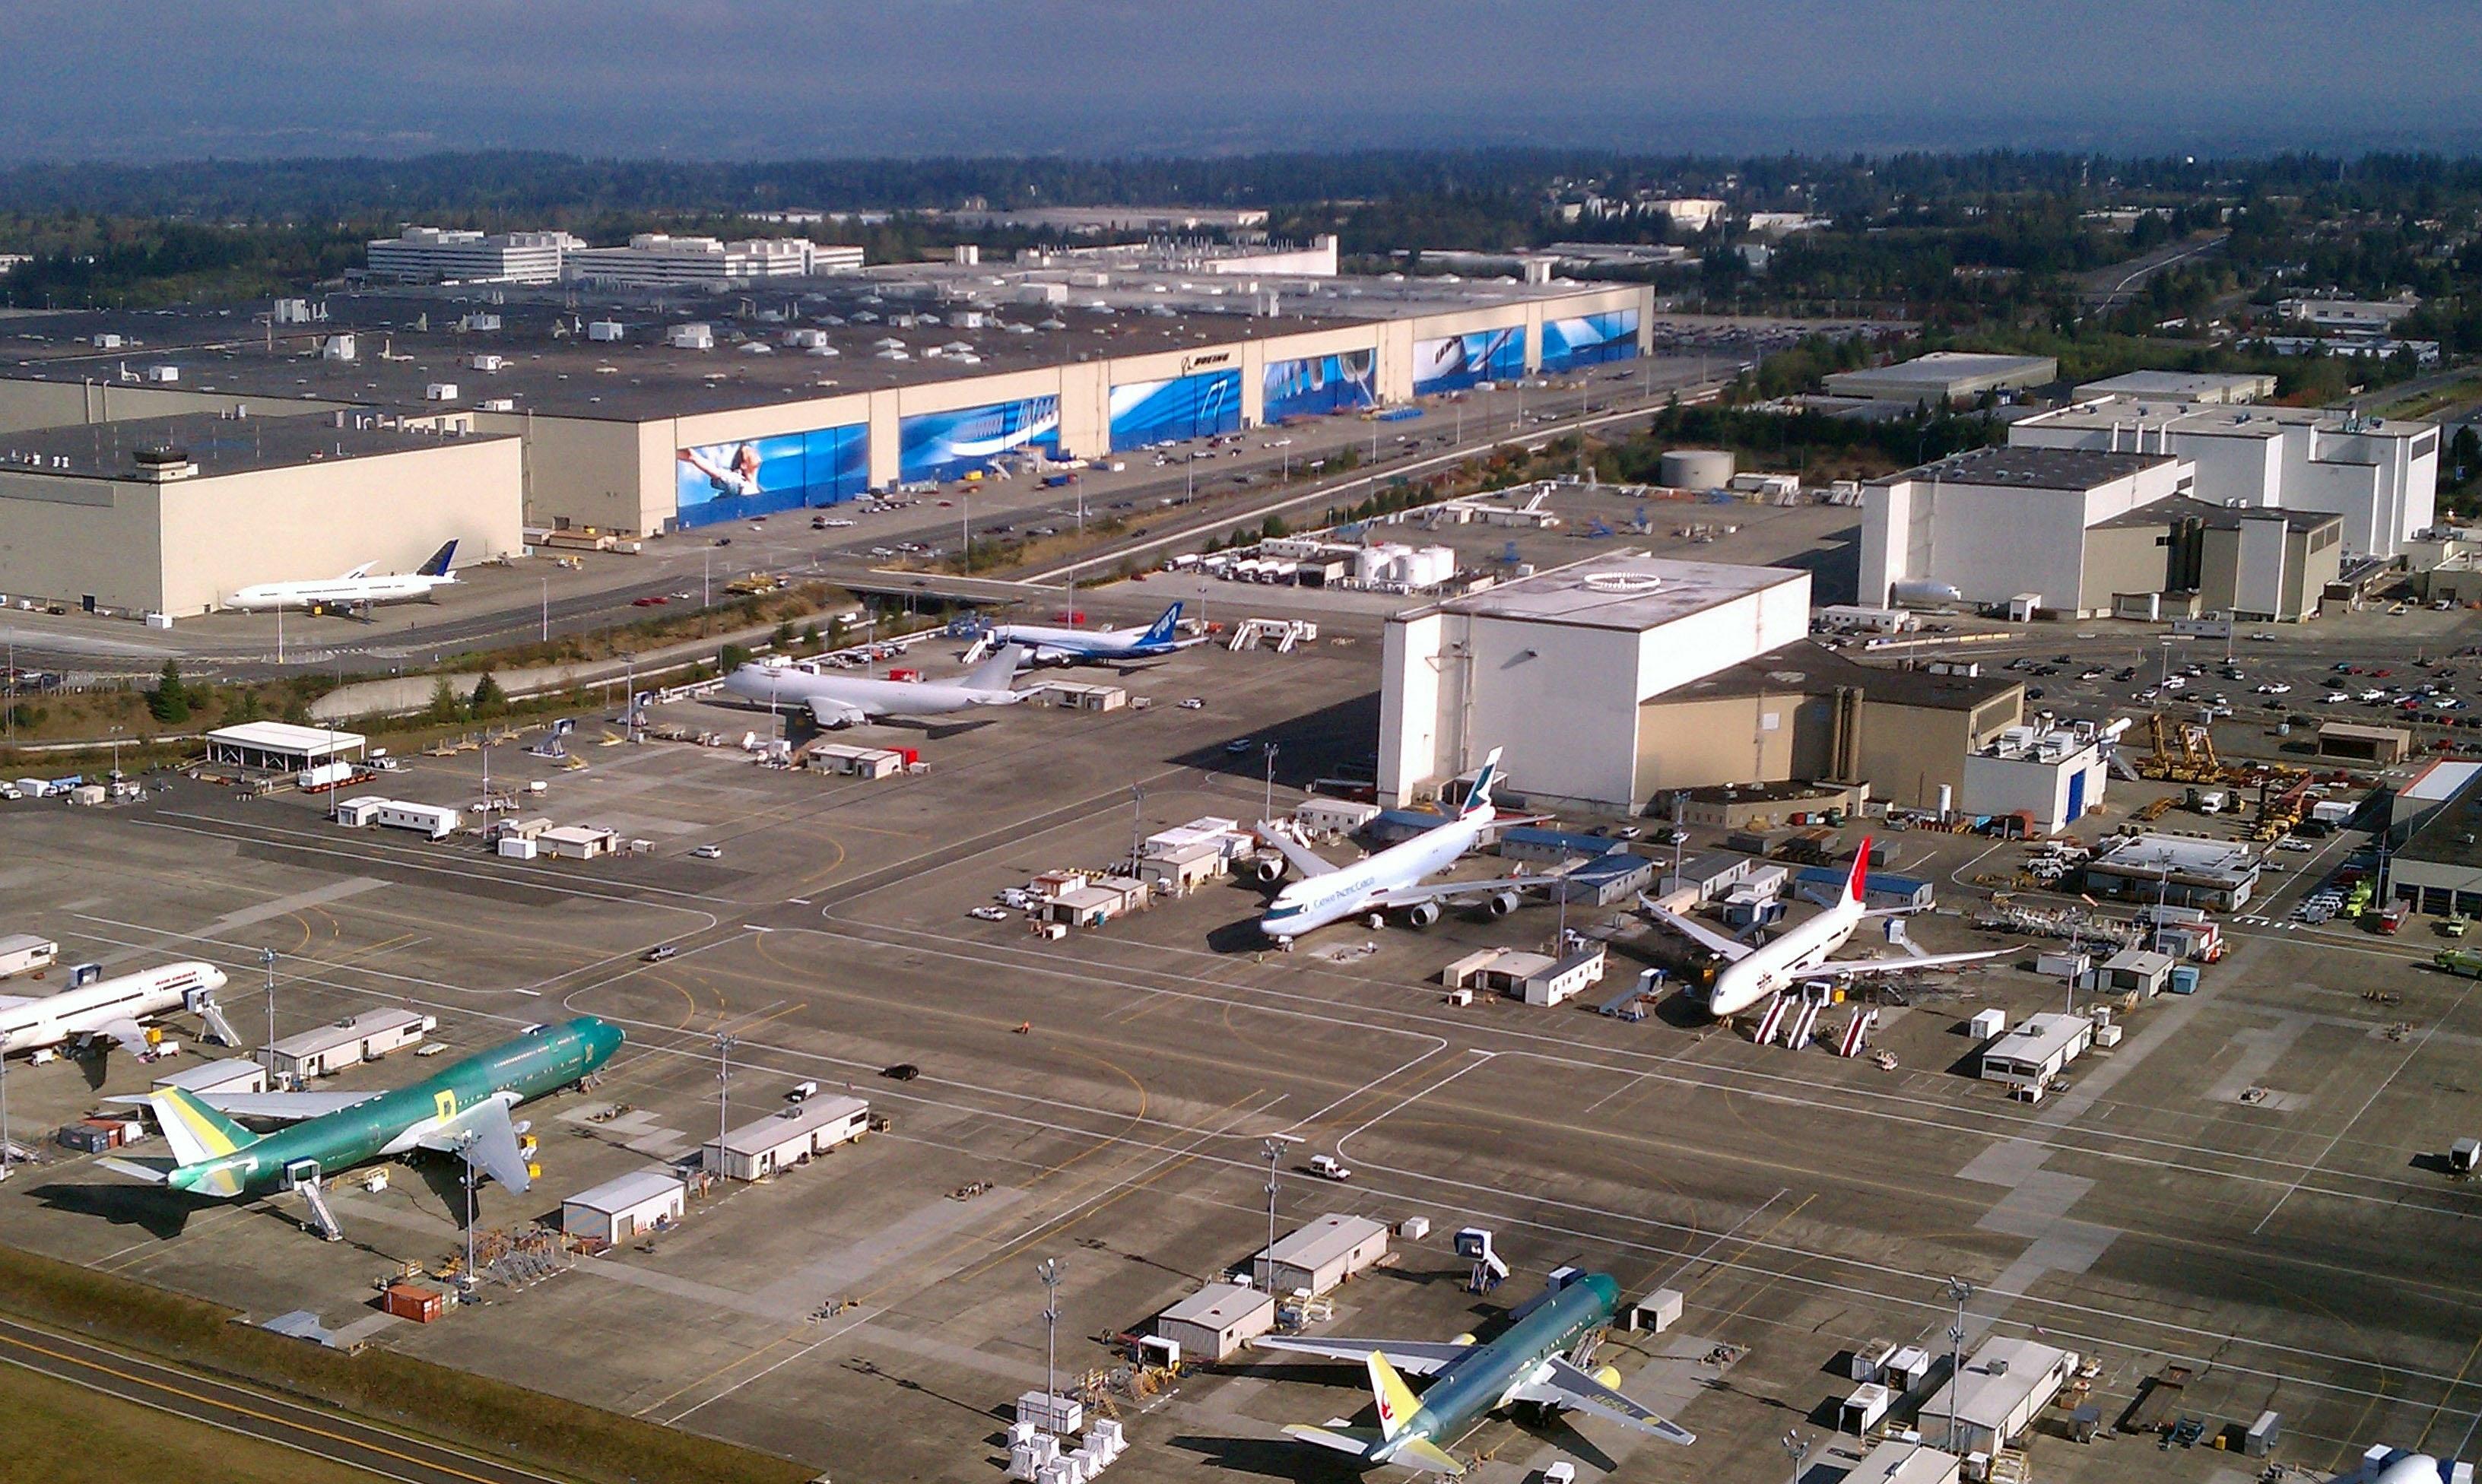 Datei:aerial Boeing Everett Factory October 2011 – Wikipedia with regard to Boeing Everett Factory Map